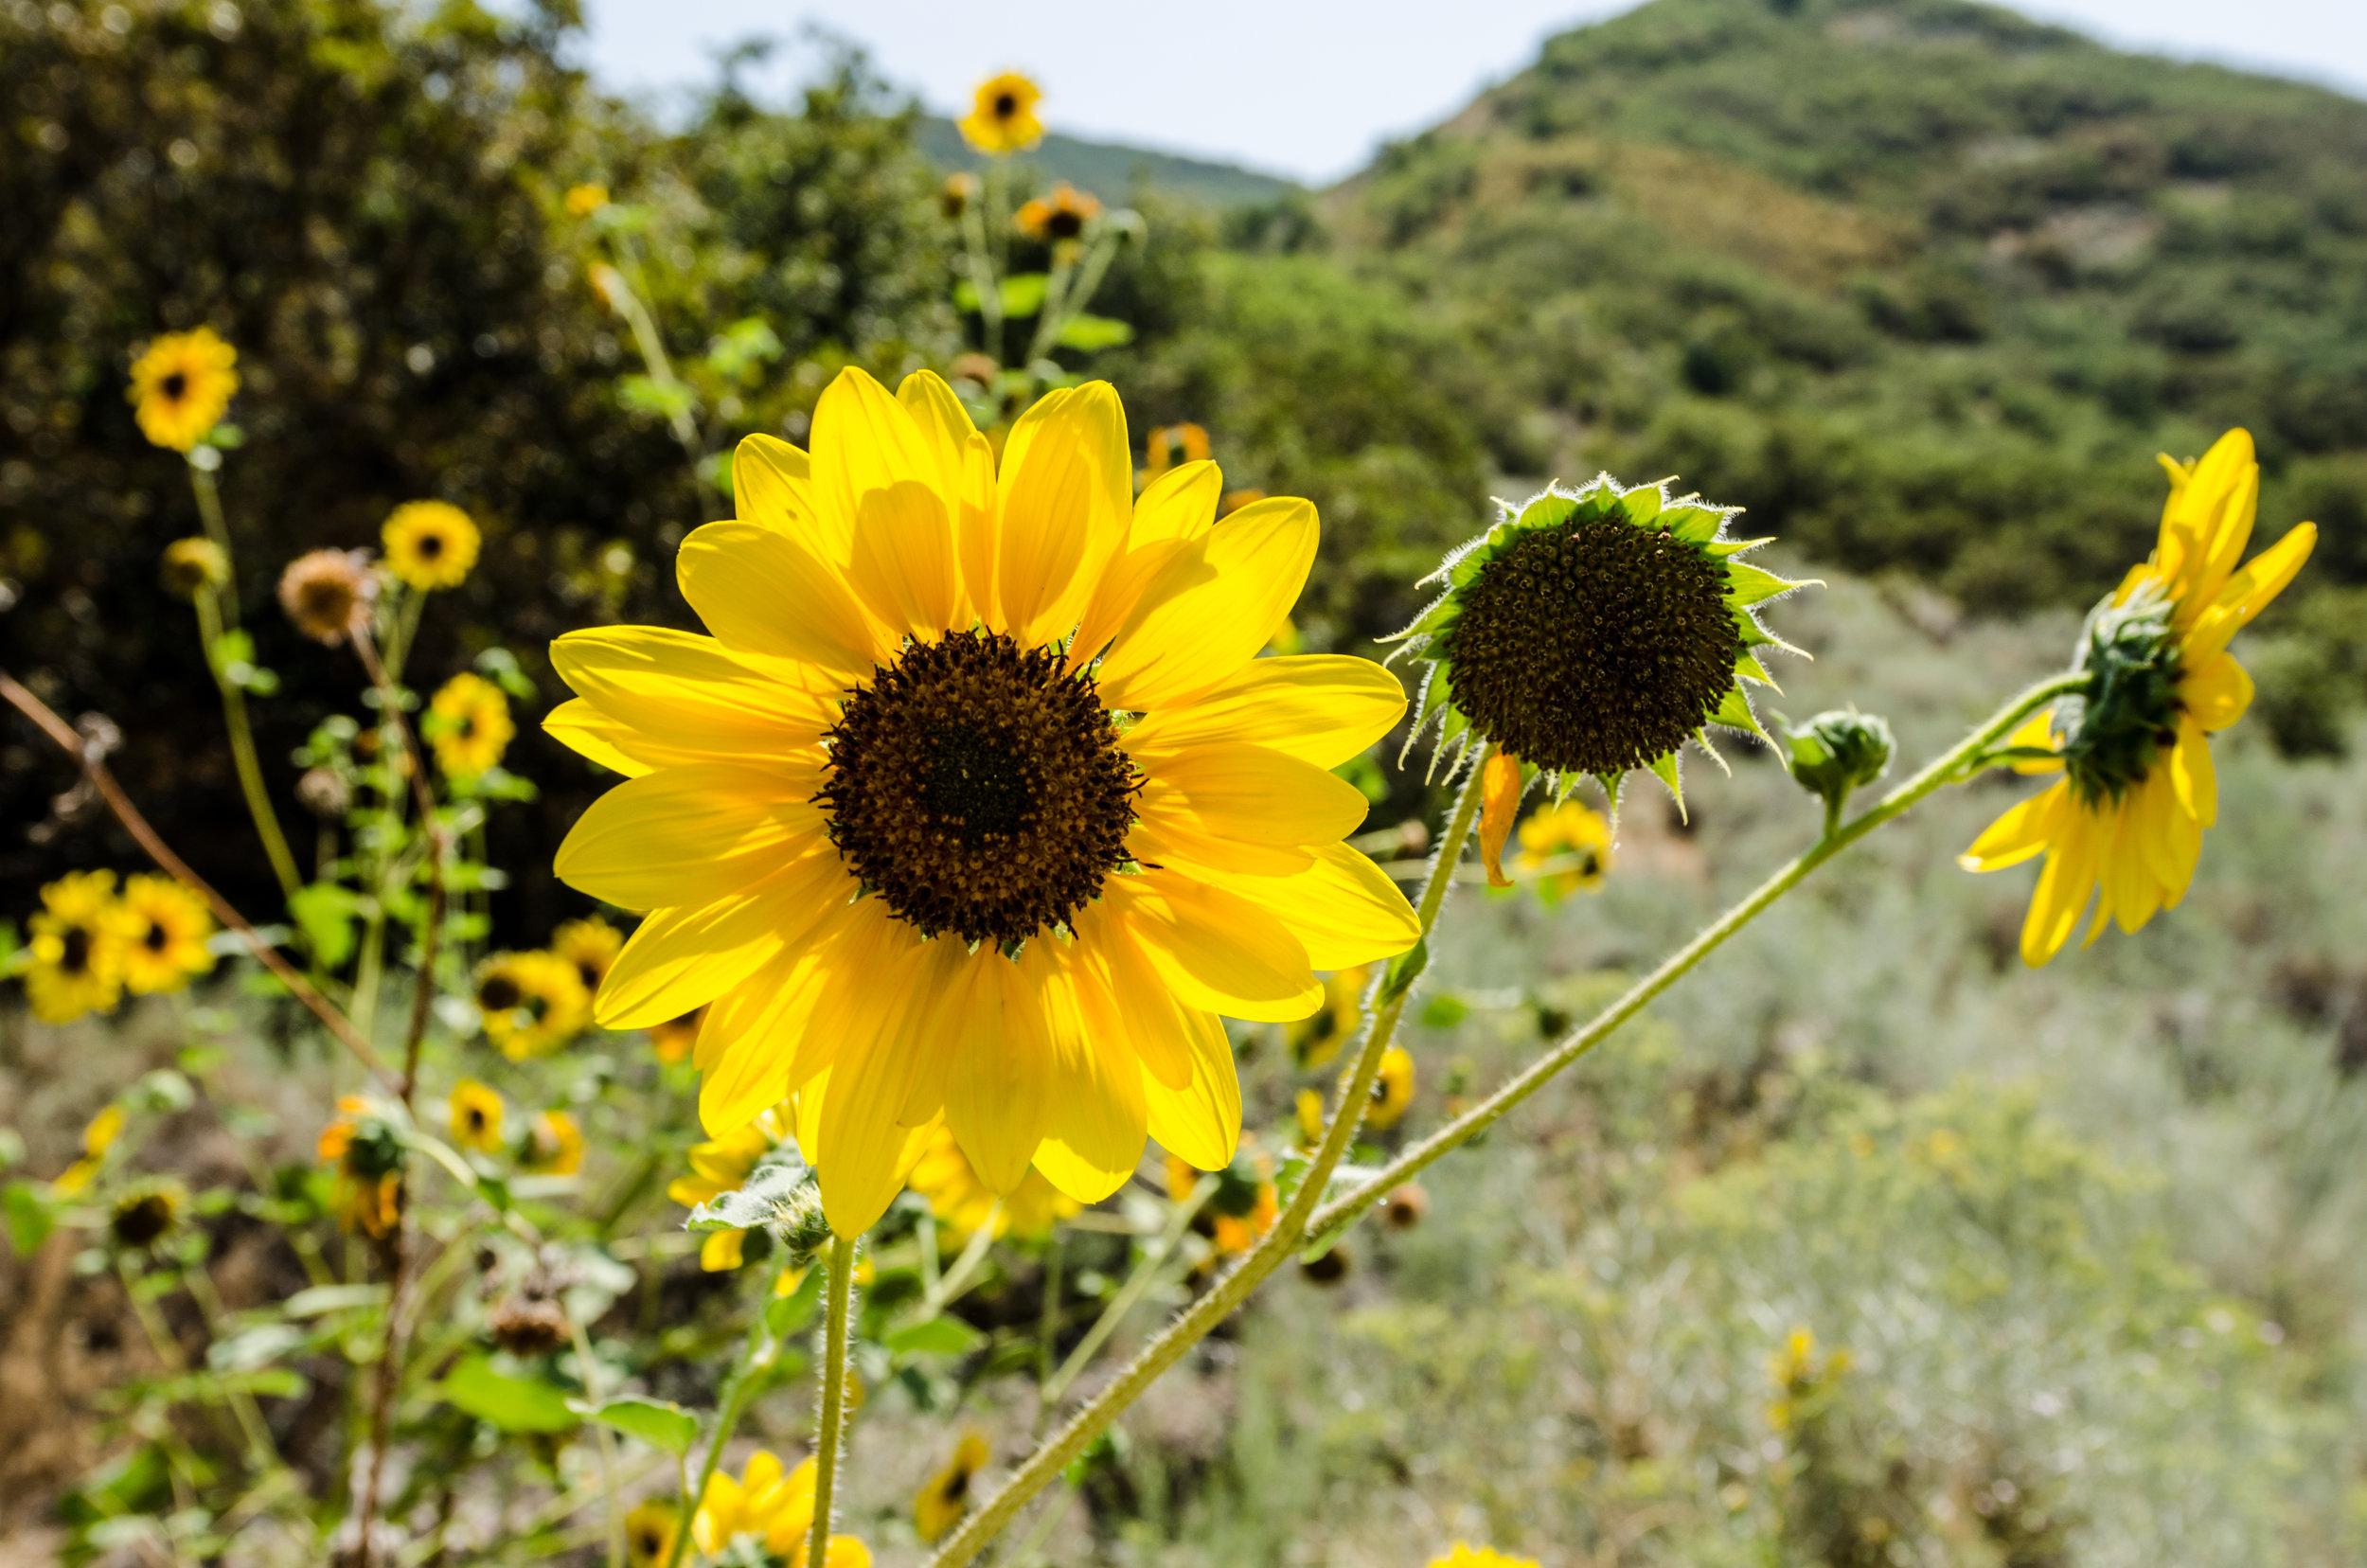 Annual sunflower (Helianthus annuus) 3.jpg